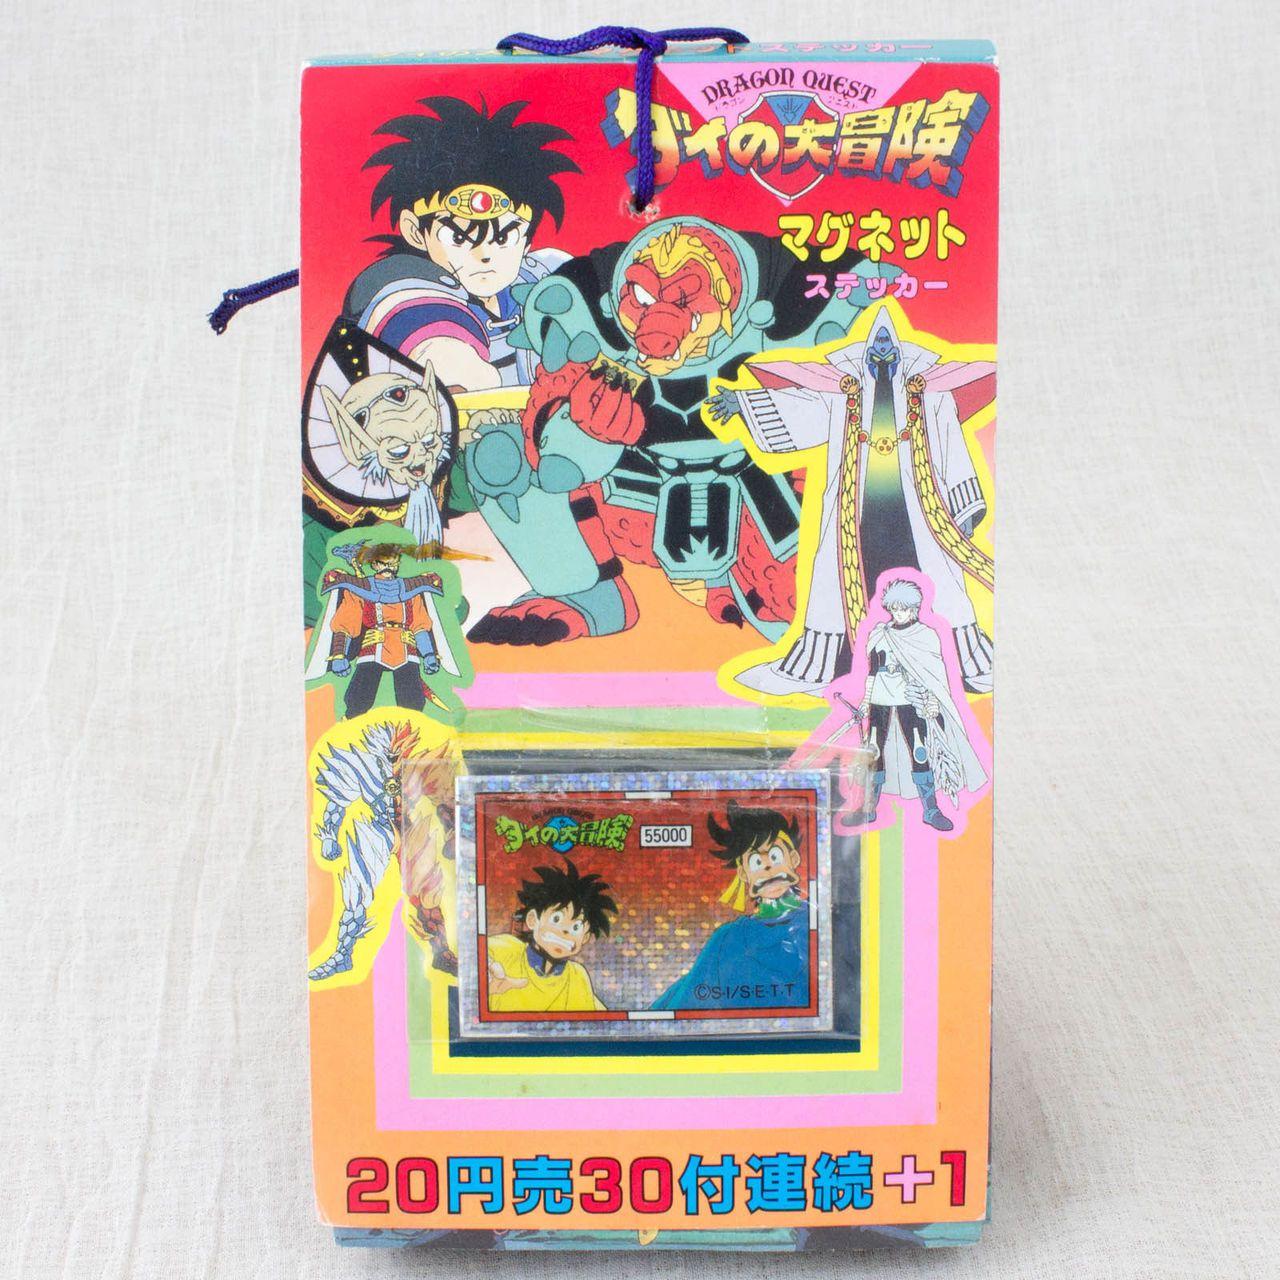 Dai no Daibouken Adventure Dragon Quest Magnet Stickers 33pc Set TAKARA JAPAN